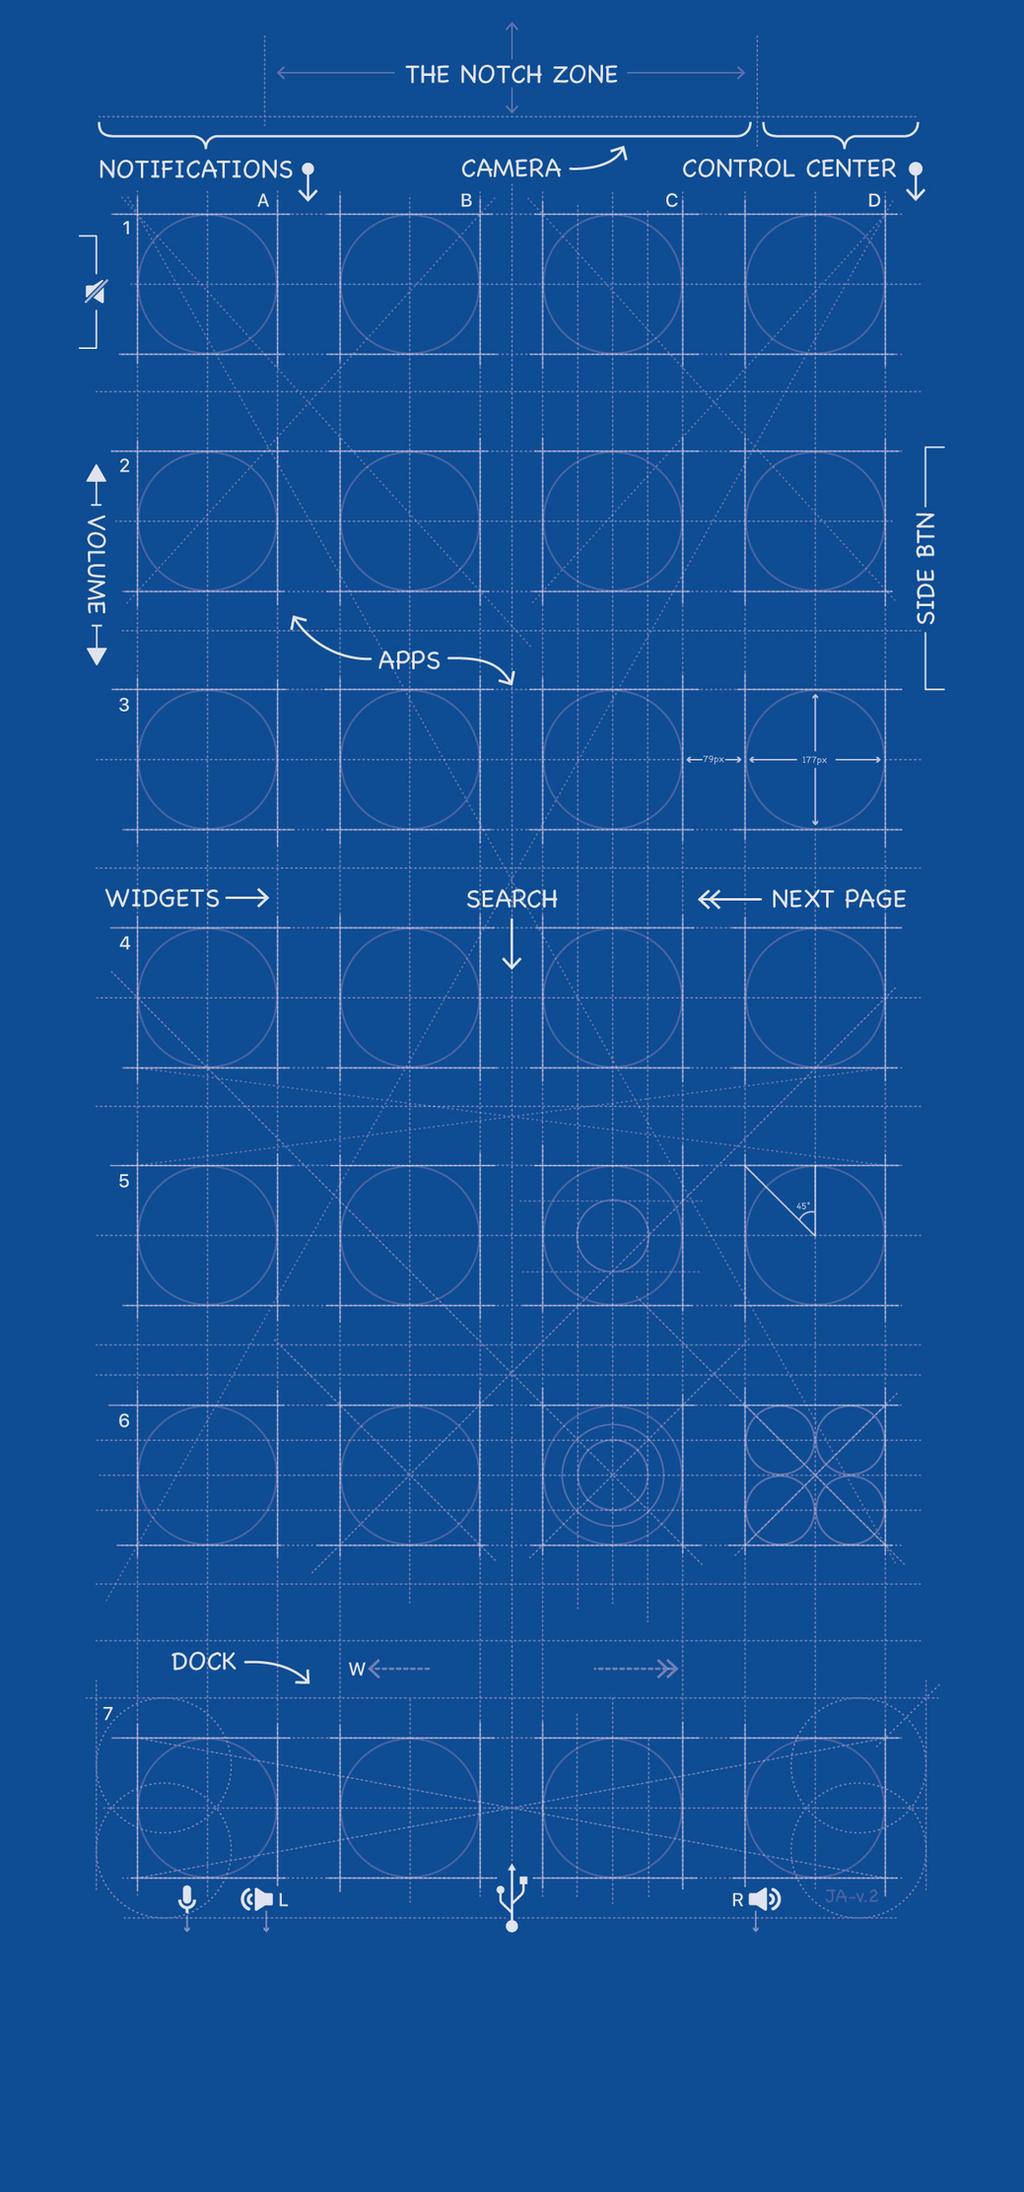 Iphone 5 blueprint wallpaper 640x1136 by mrdude42 on deviantart iphone x blueprint wallpaper by mrdude42 malvernweather Gallery